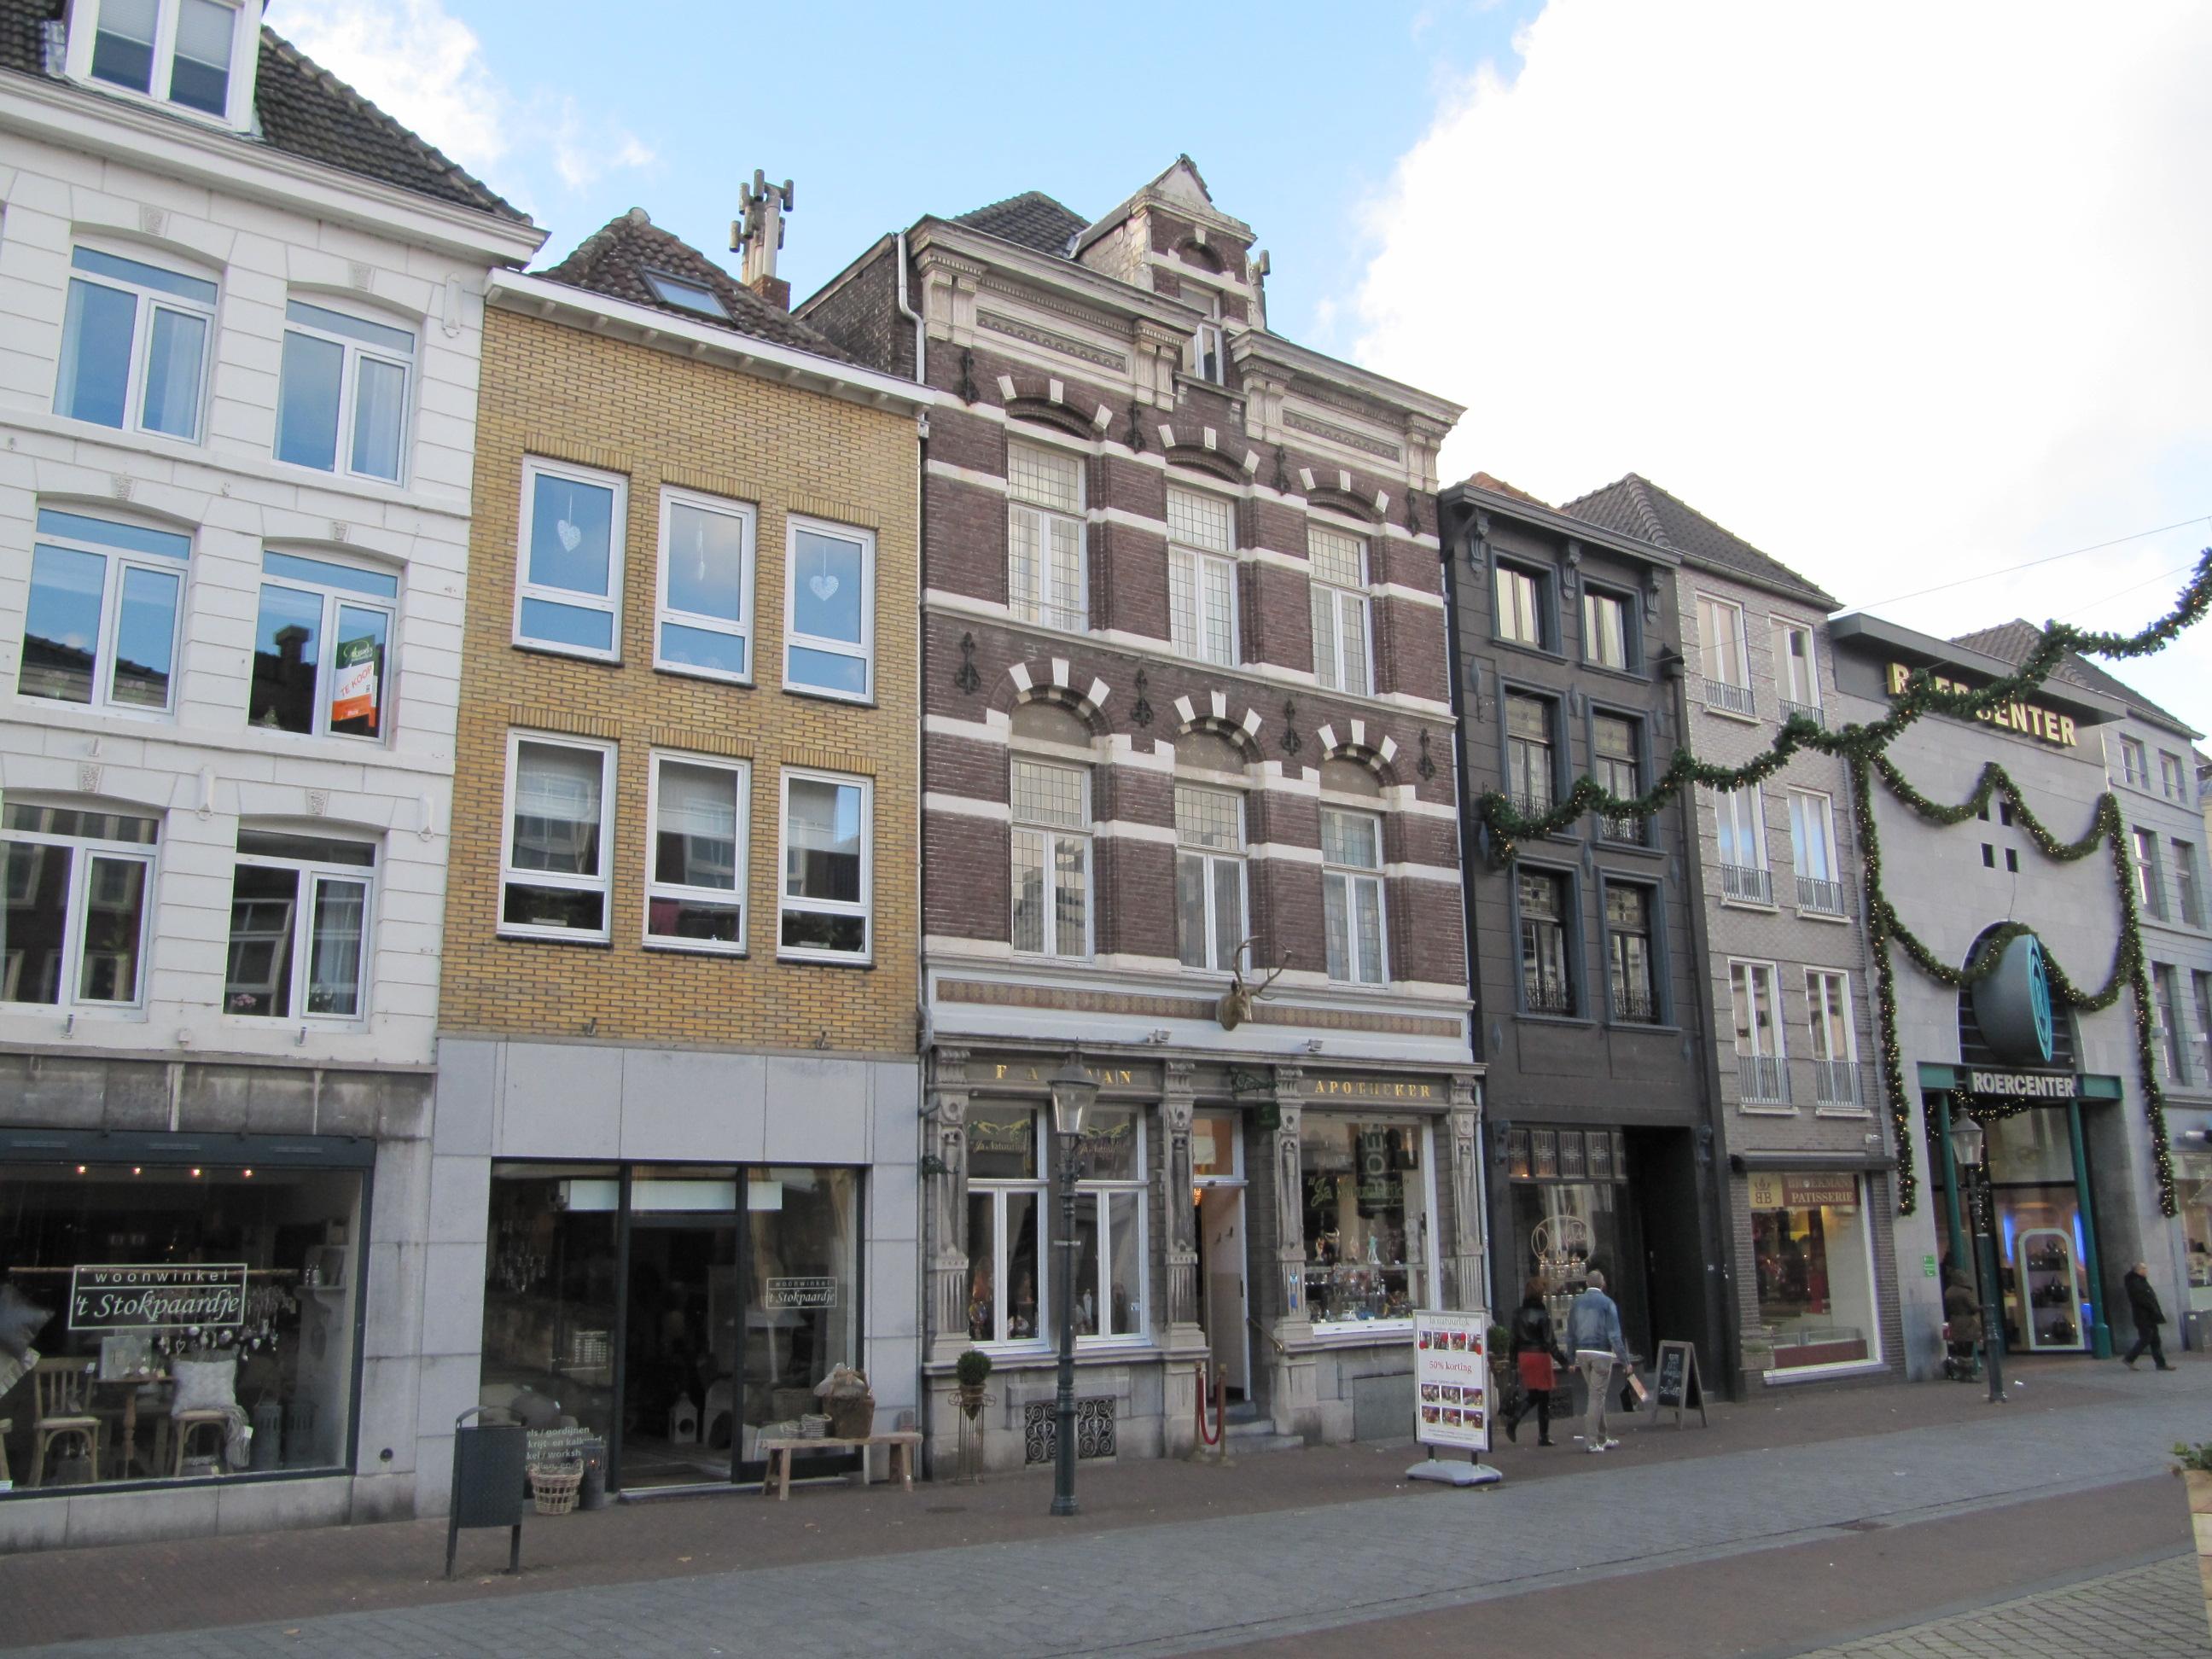 F A Haan Apotheek in Roermond | Monument - Rijksmonumenten.nl